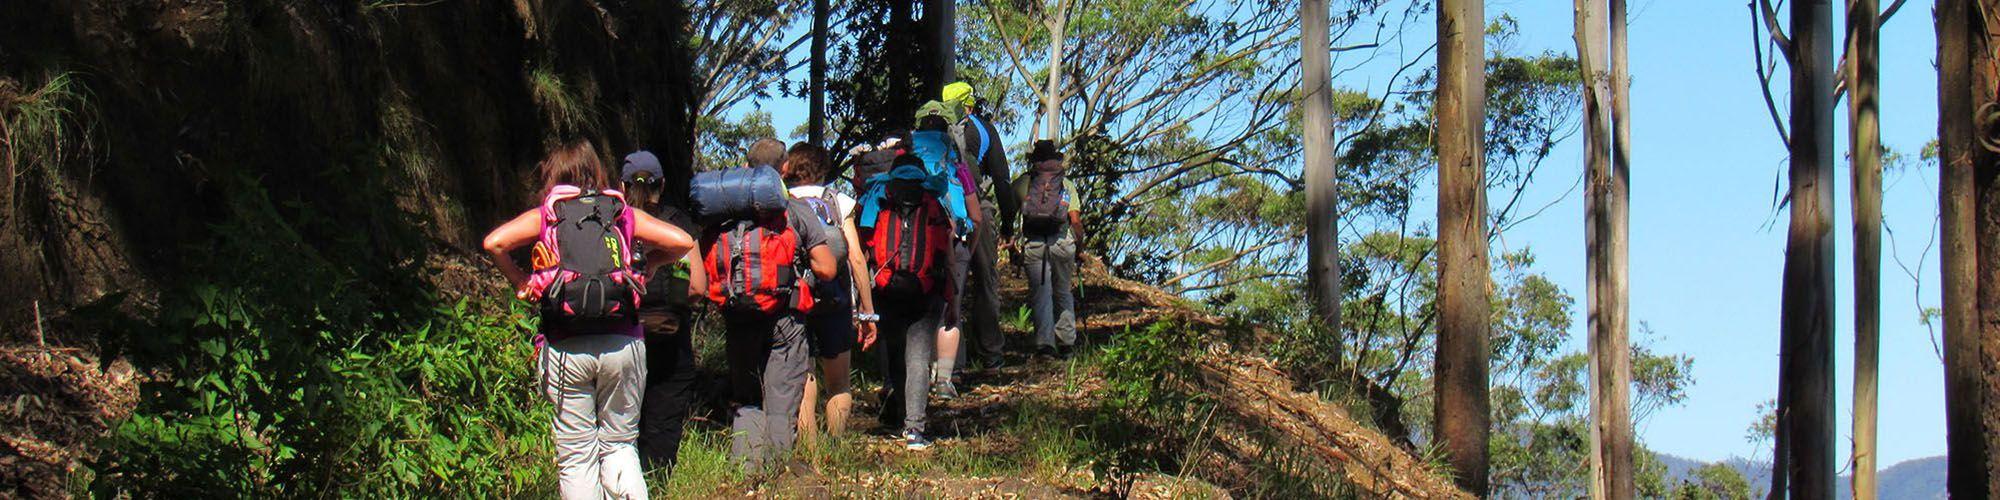 Sri Lanka, Trekking, Kitulgala, View